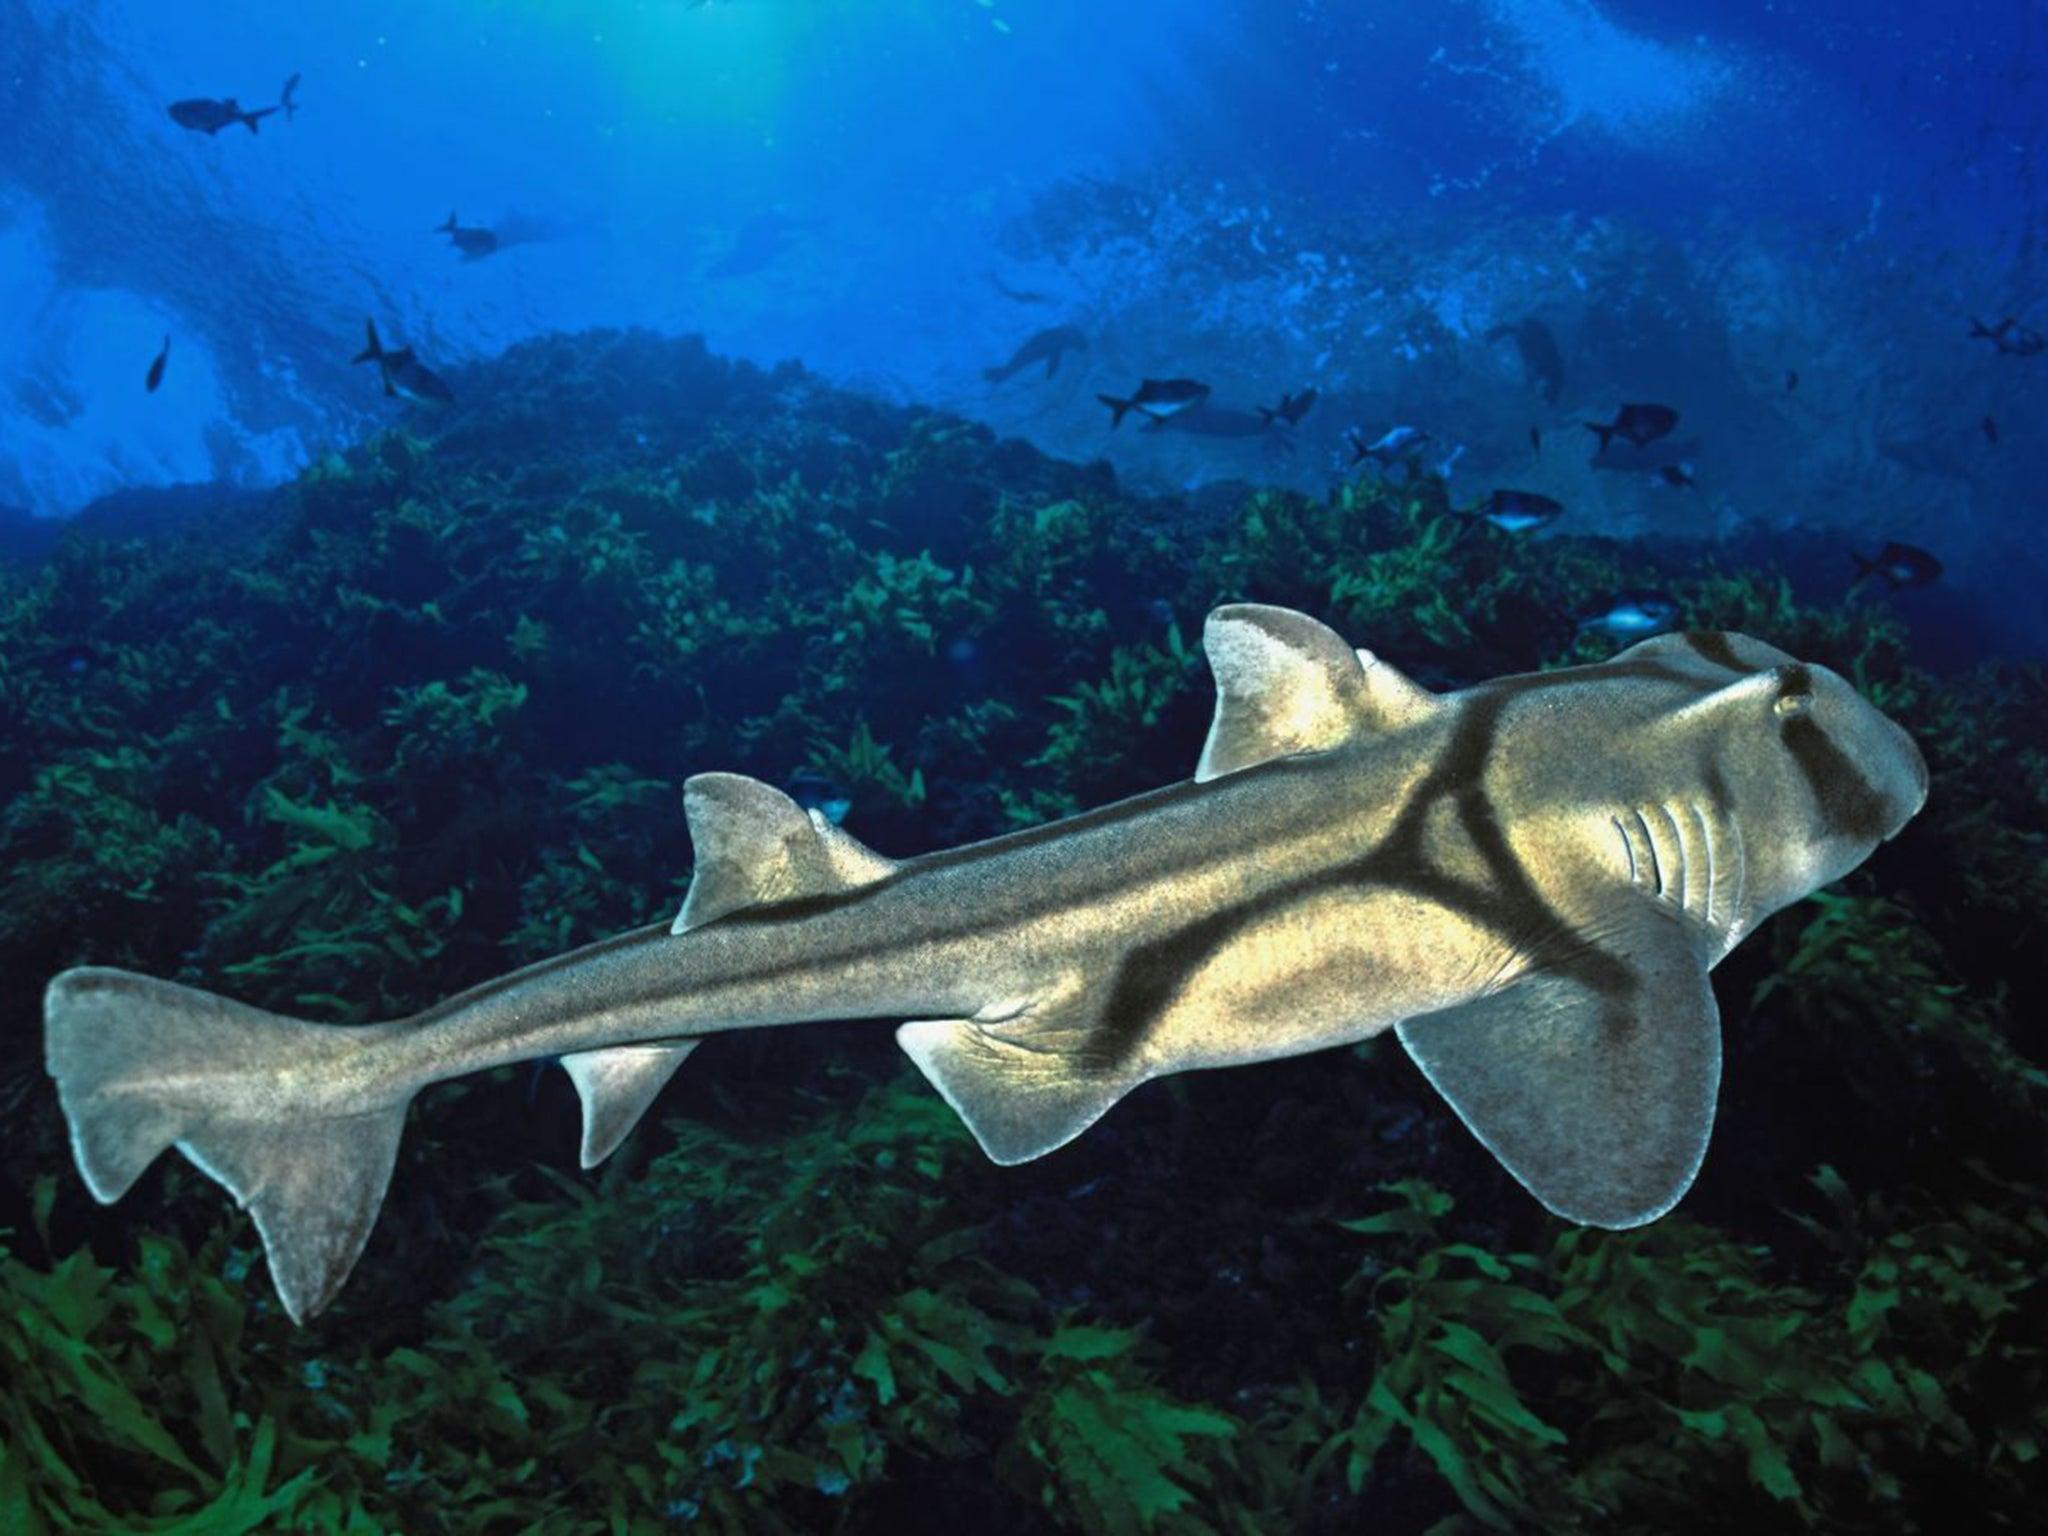 global warming could make sharks u0027smaller and less aggressive